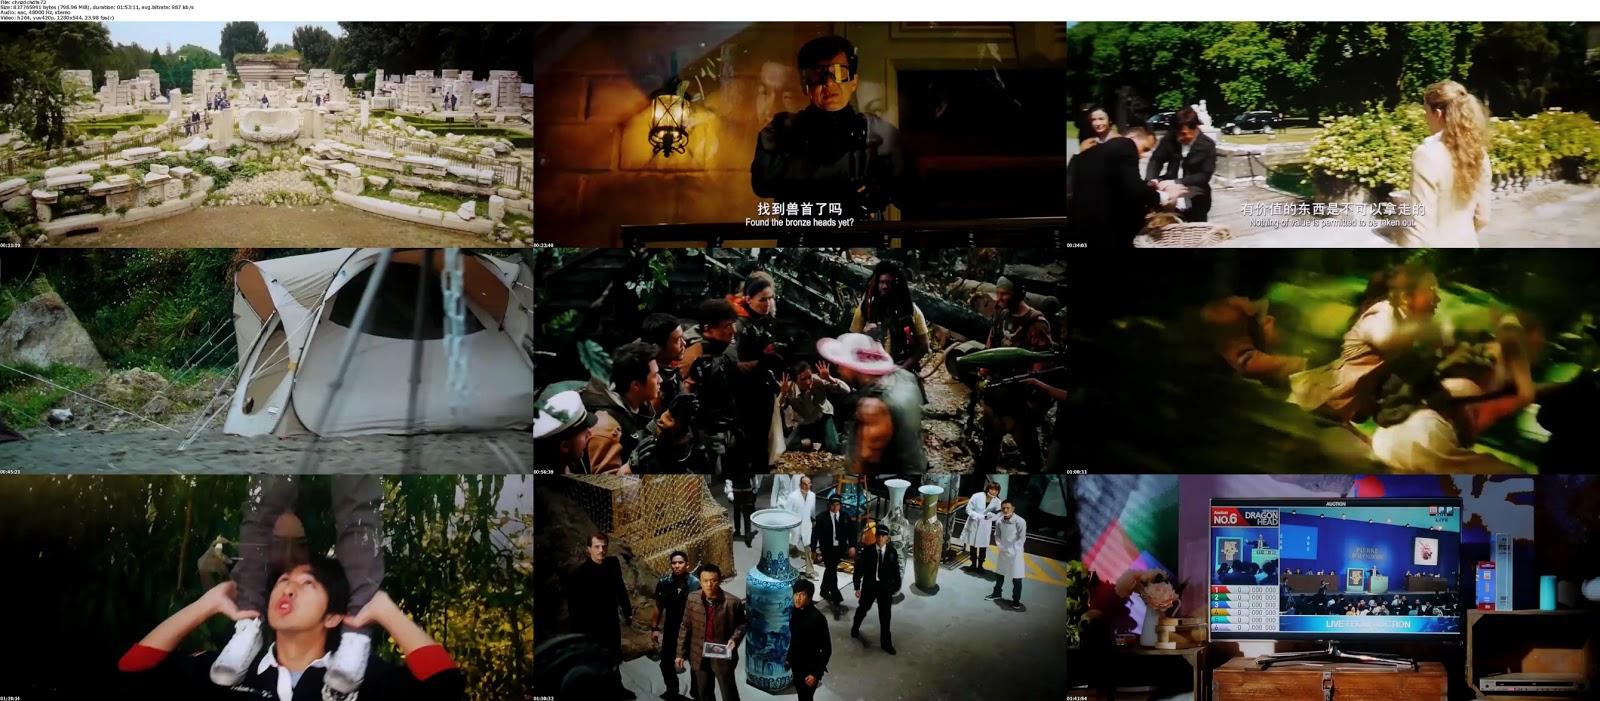 zodiac movie online with english subtitles